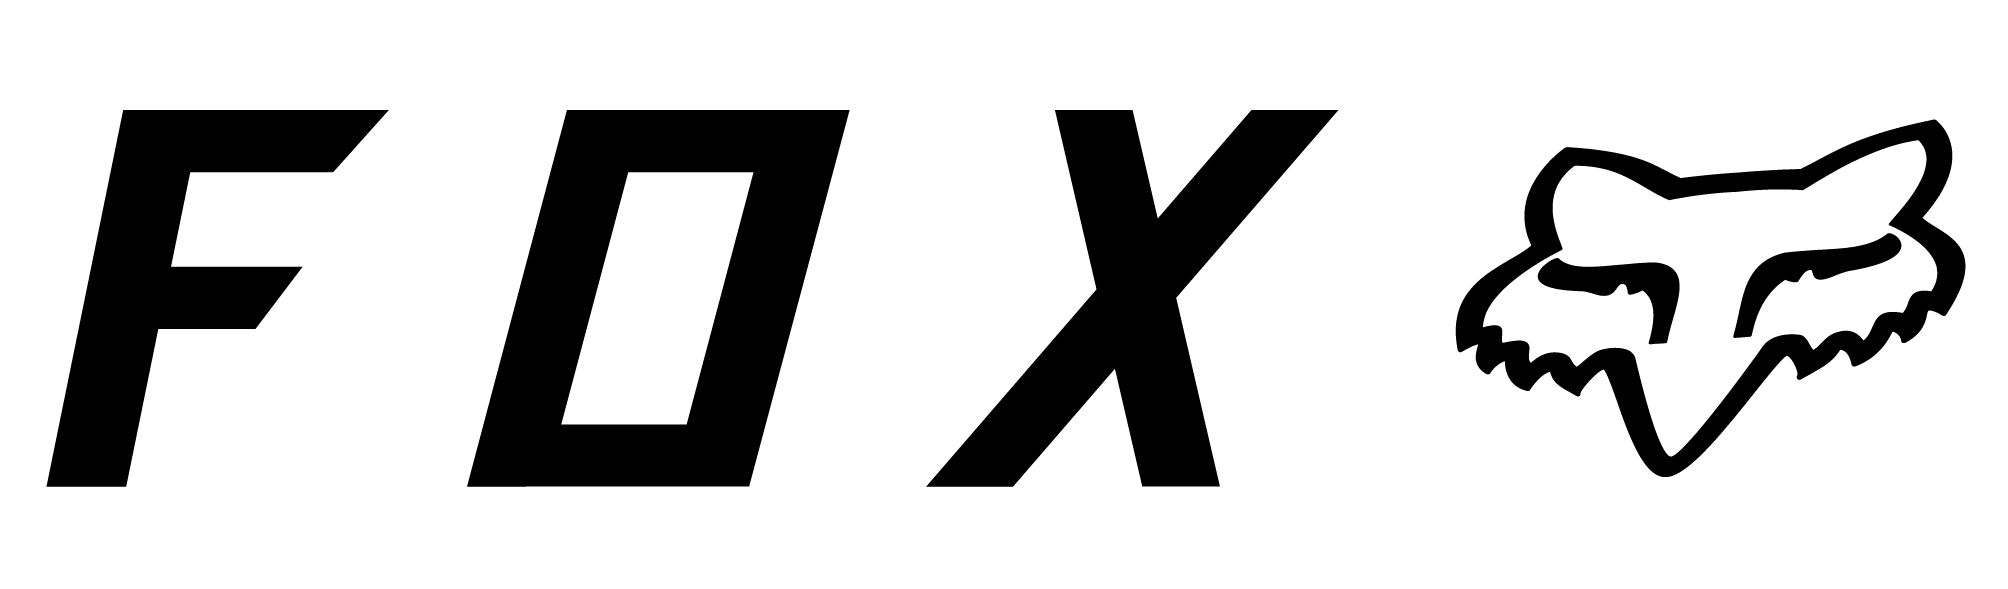 fox racing logo vector eps free download logo icons clipart rh freelogovectors net